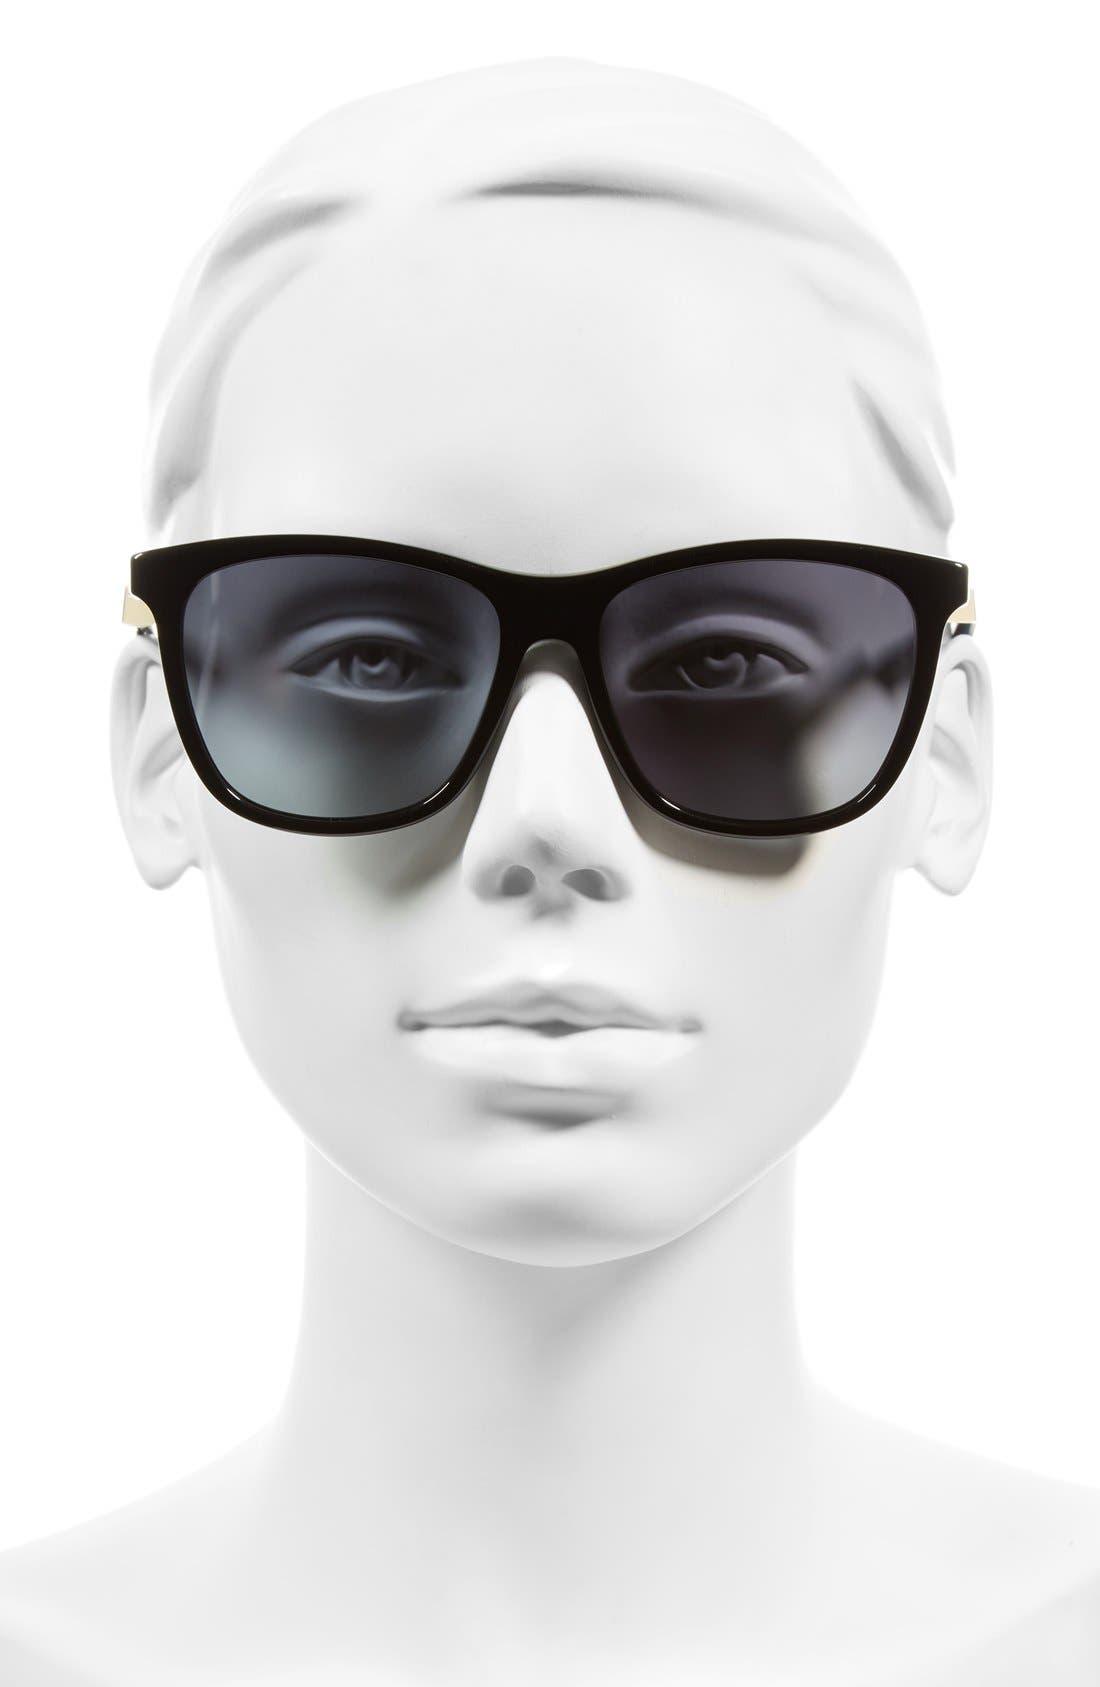 55mm Cube Retro Sunglasses,                             Alternate thumbnail 7, color,